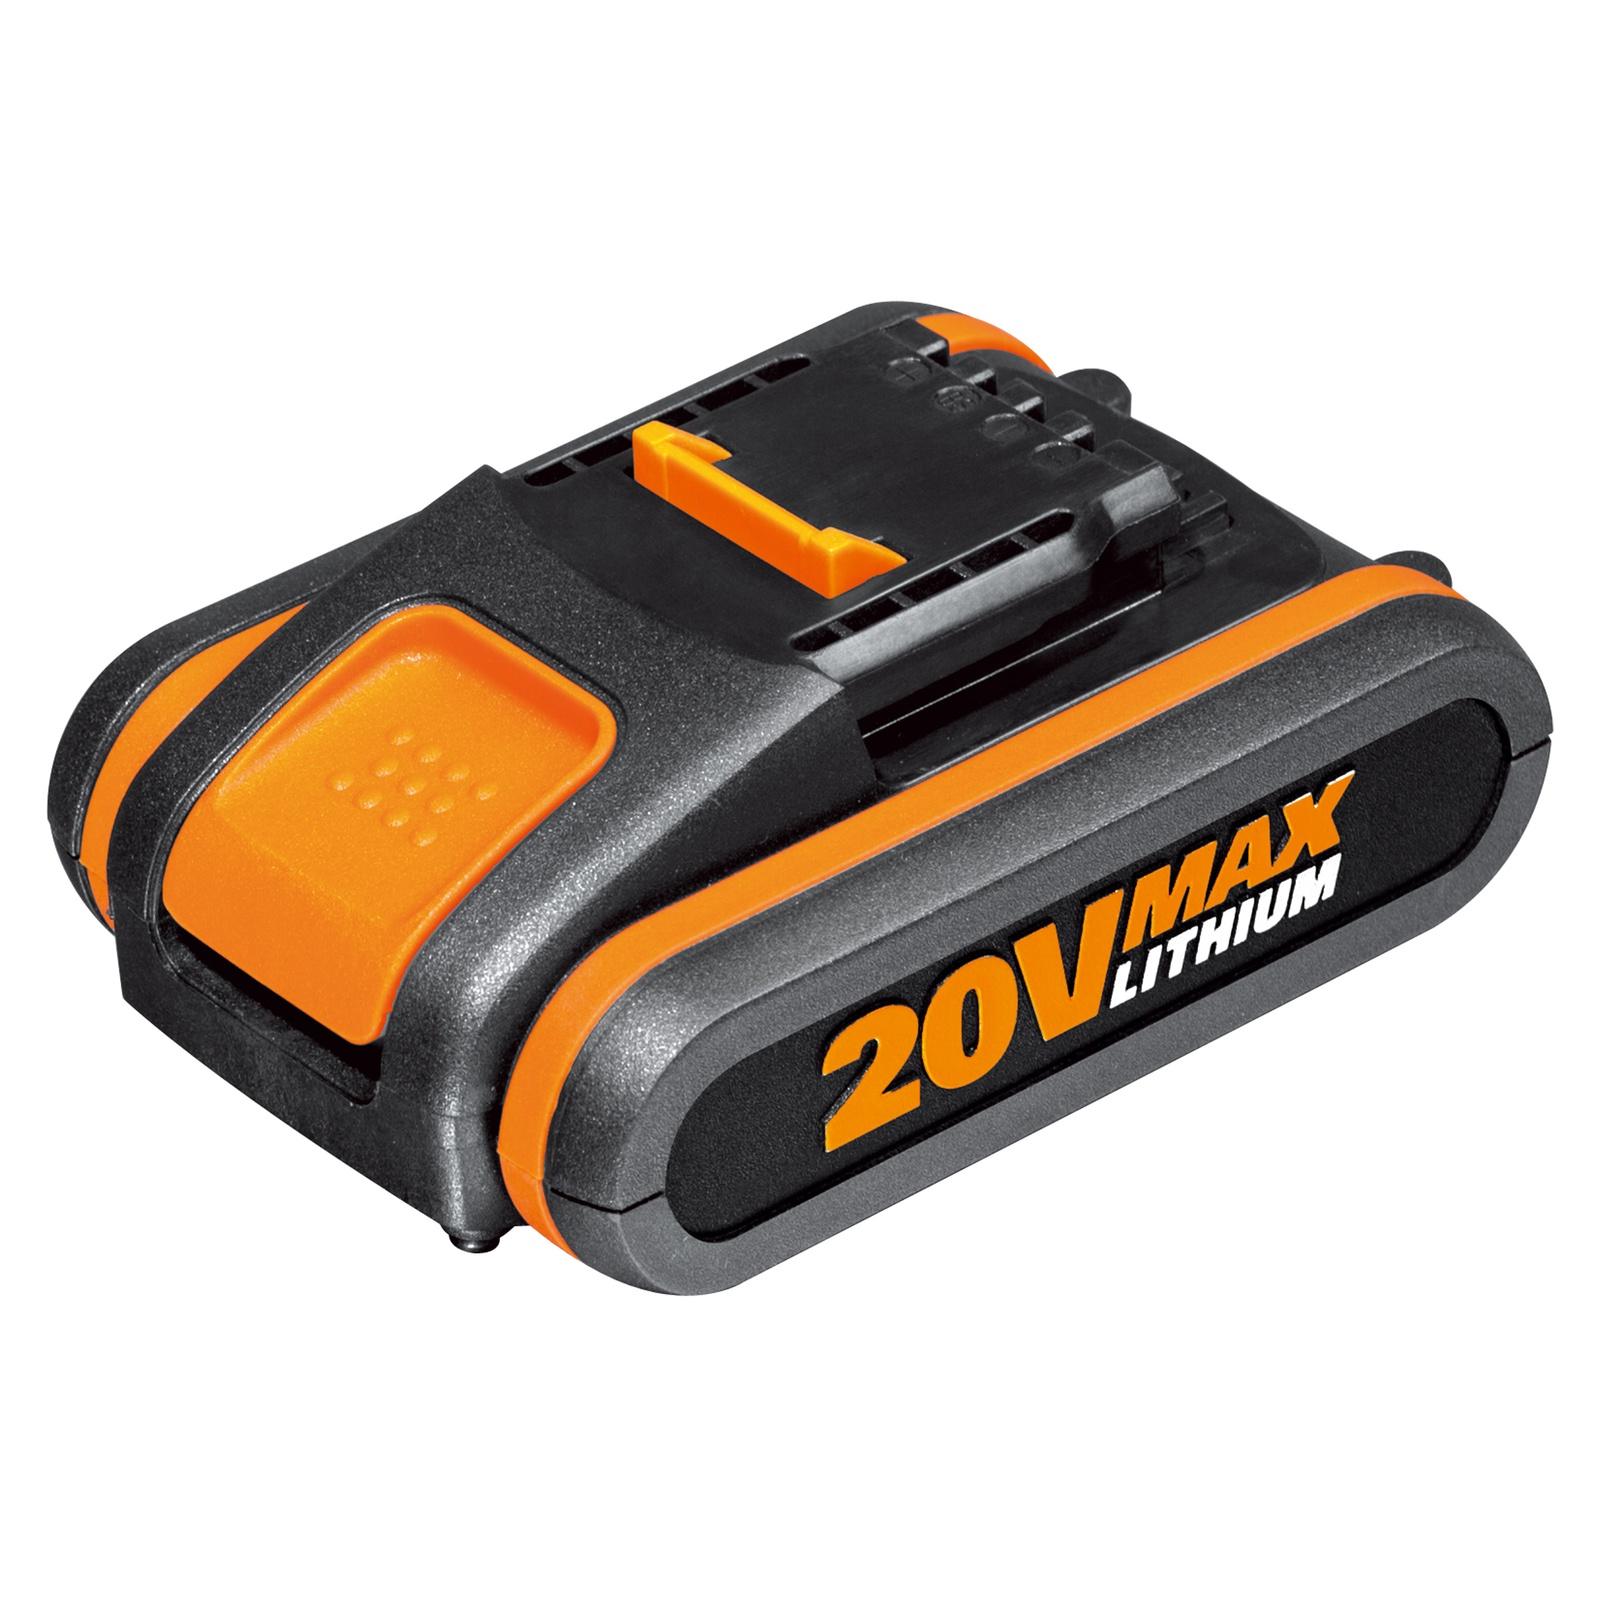 Аккумулятор для инструмента WORX WA3551 аккумуляторы для автомобиля 65 а ч цена братск